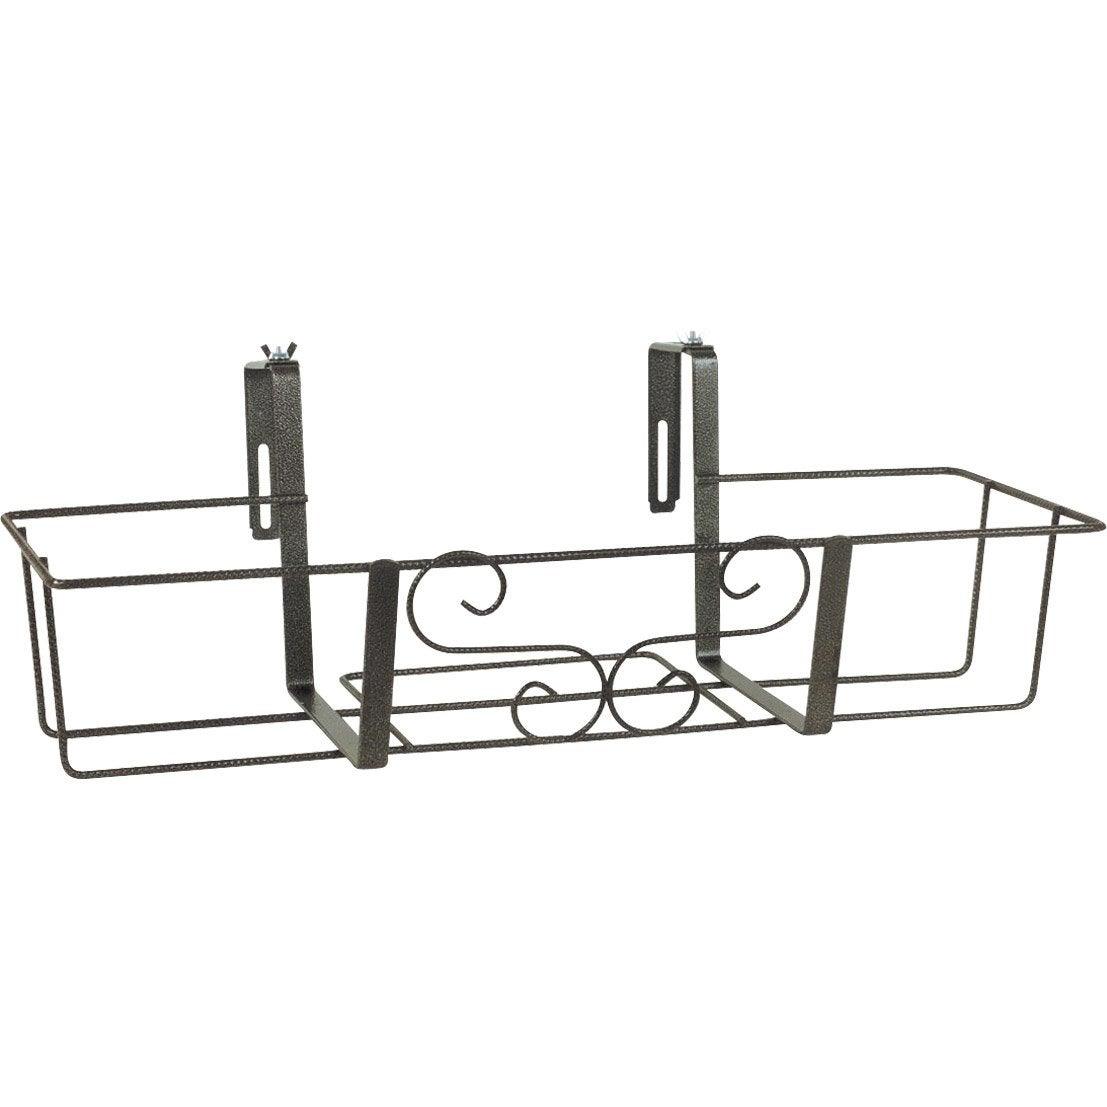 support balconni re ext rieur jardifer gris m tal leroy merlin. Black Bedroom Furniture Sets. Home Design Ideas